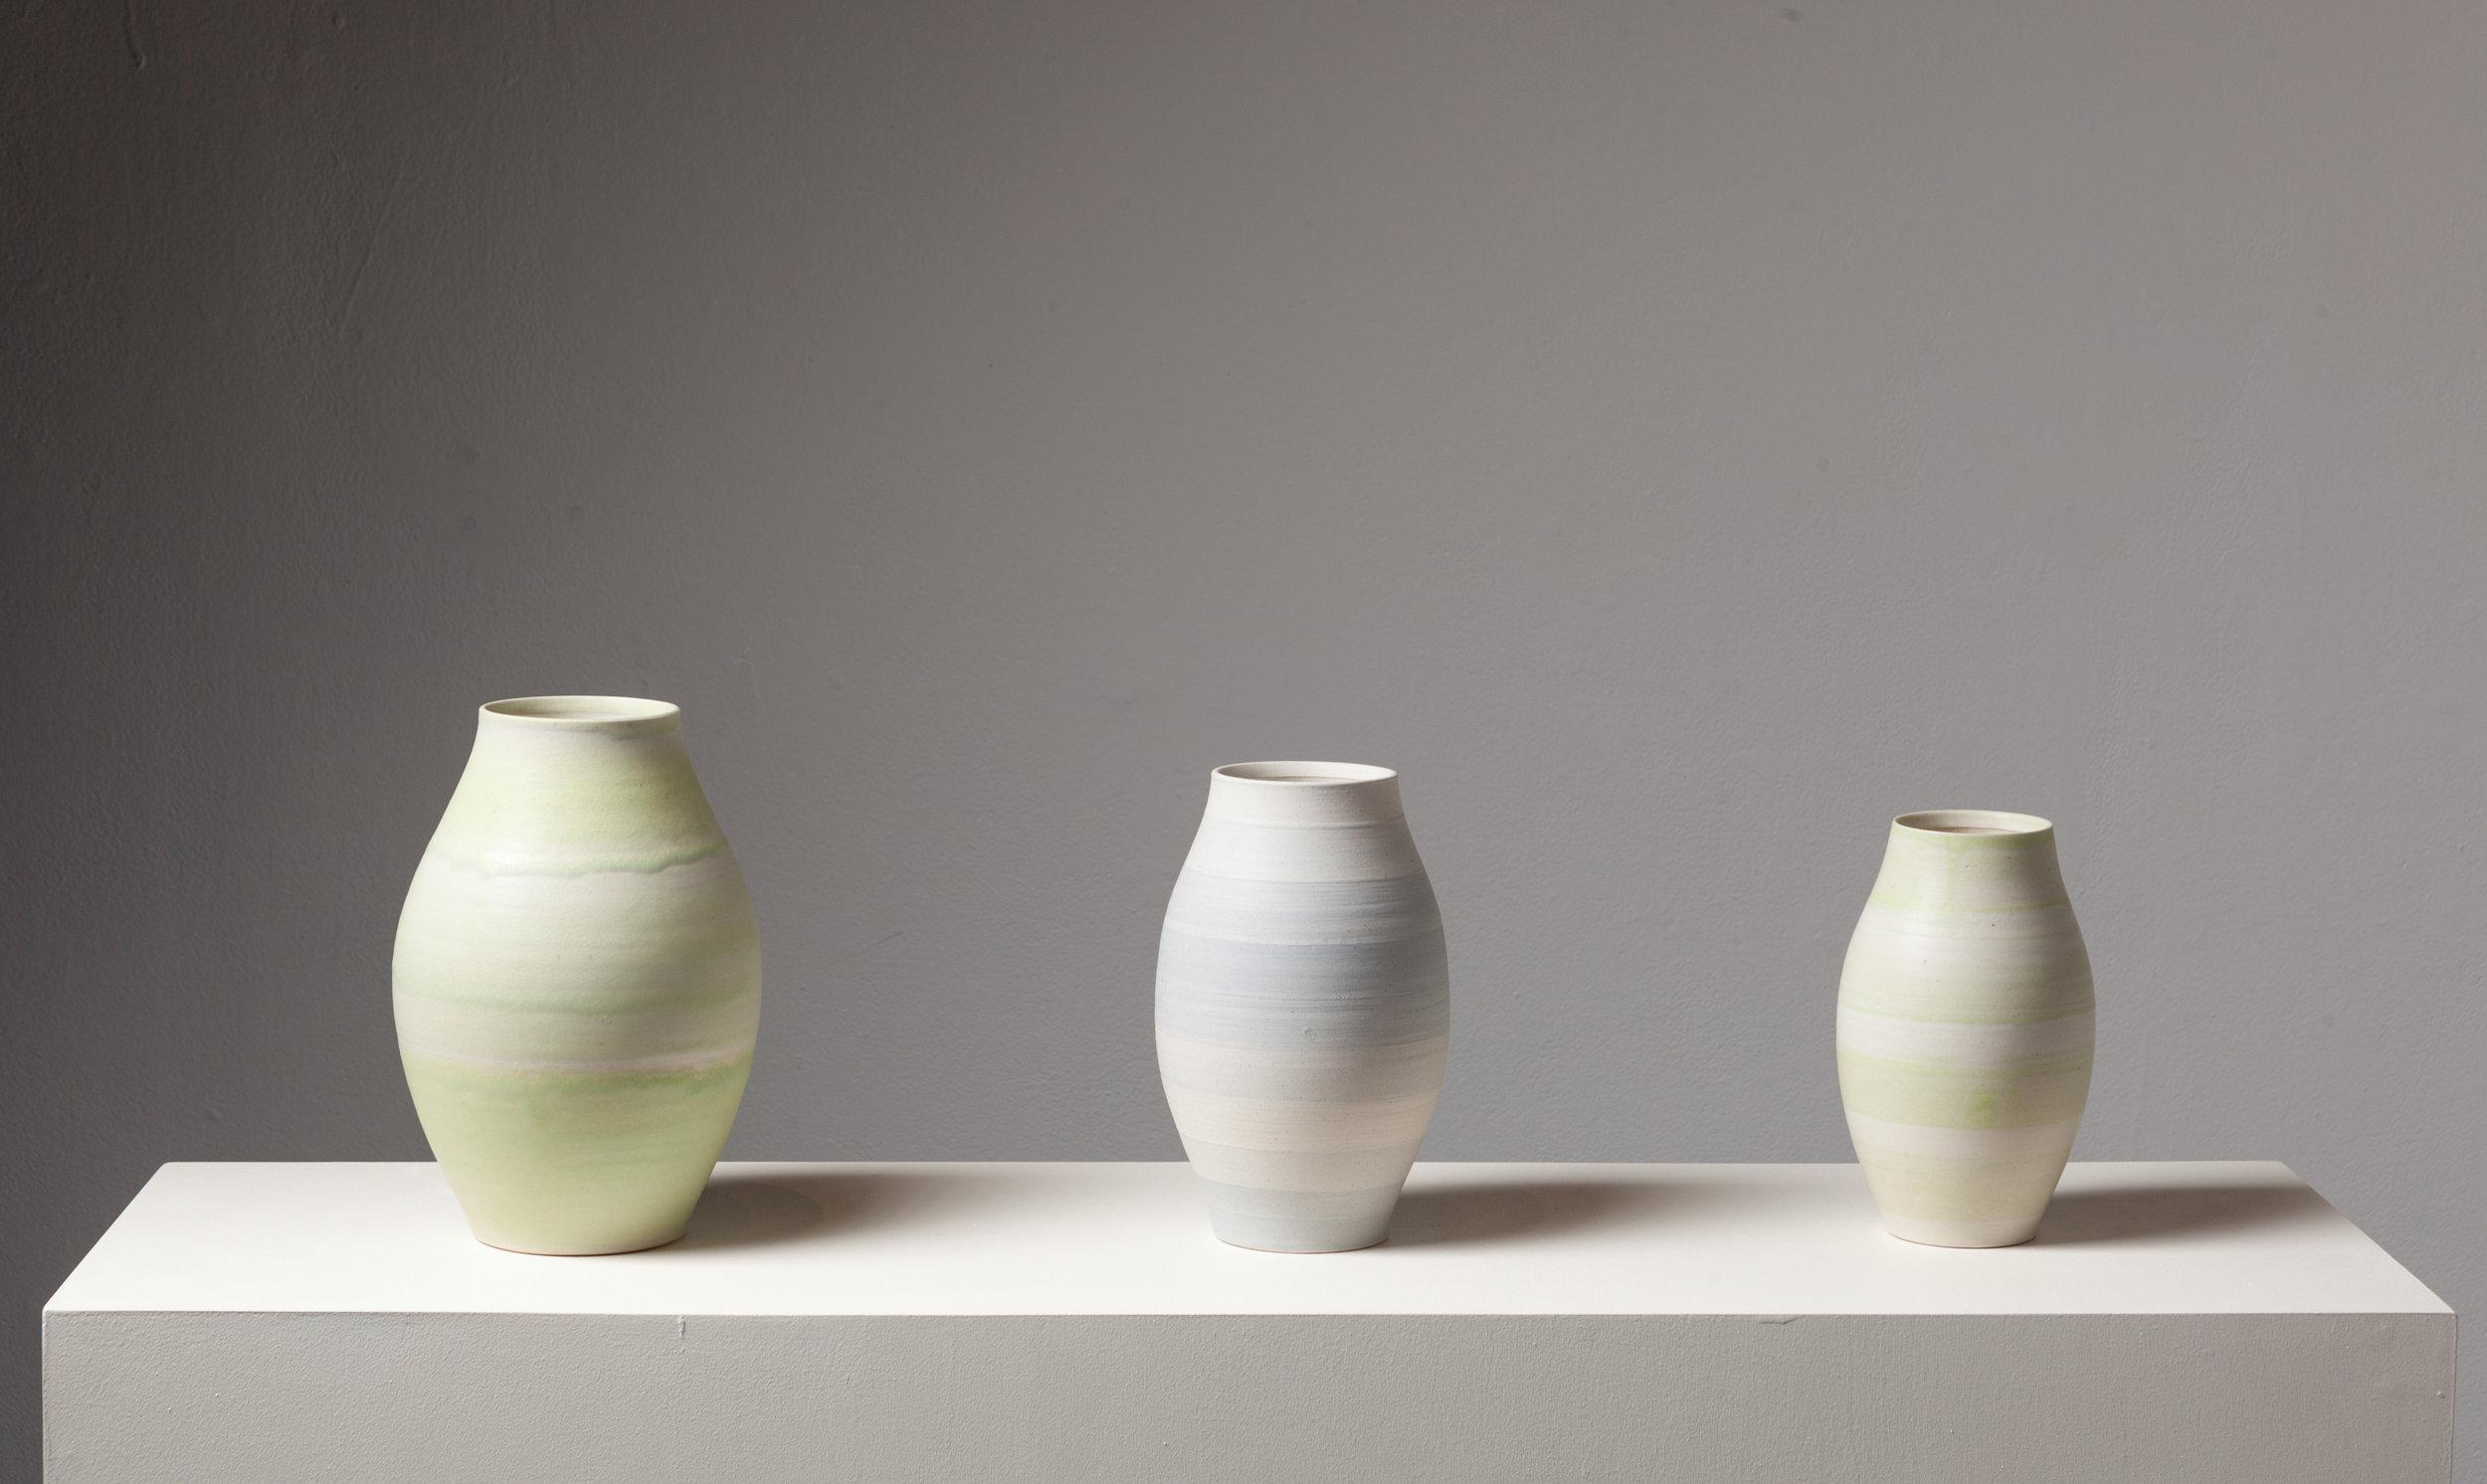 "Three Vases  Cone 10 Oxidation Porcelain  Larger Vase 8"" W x 10"" H  2016"